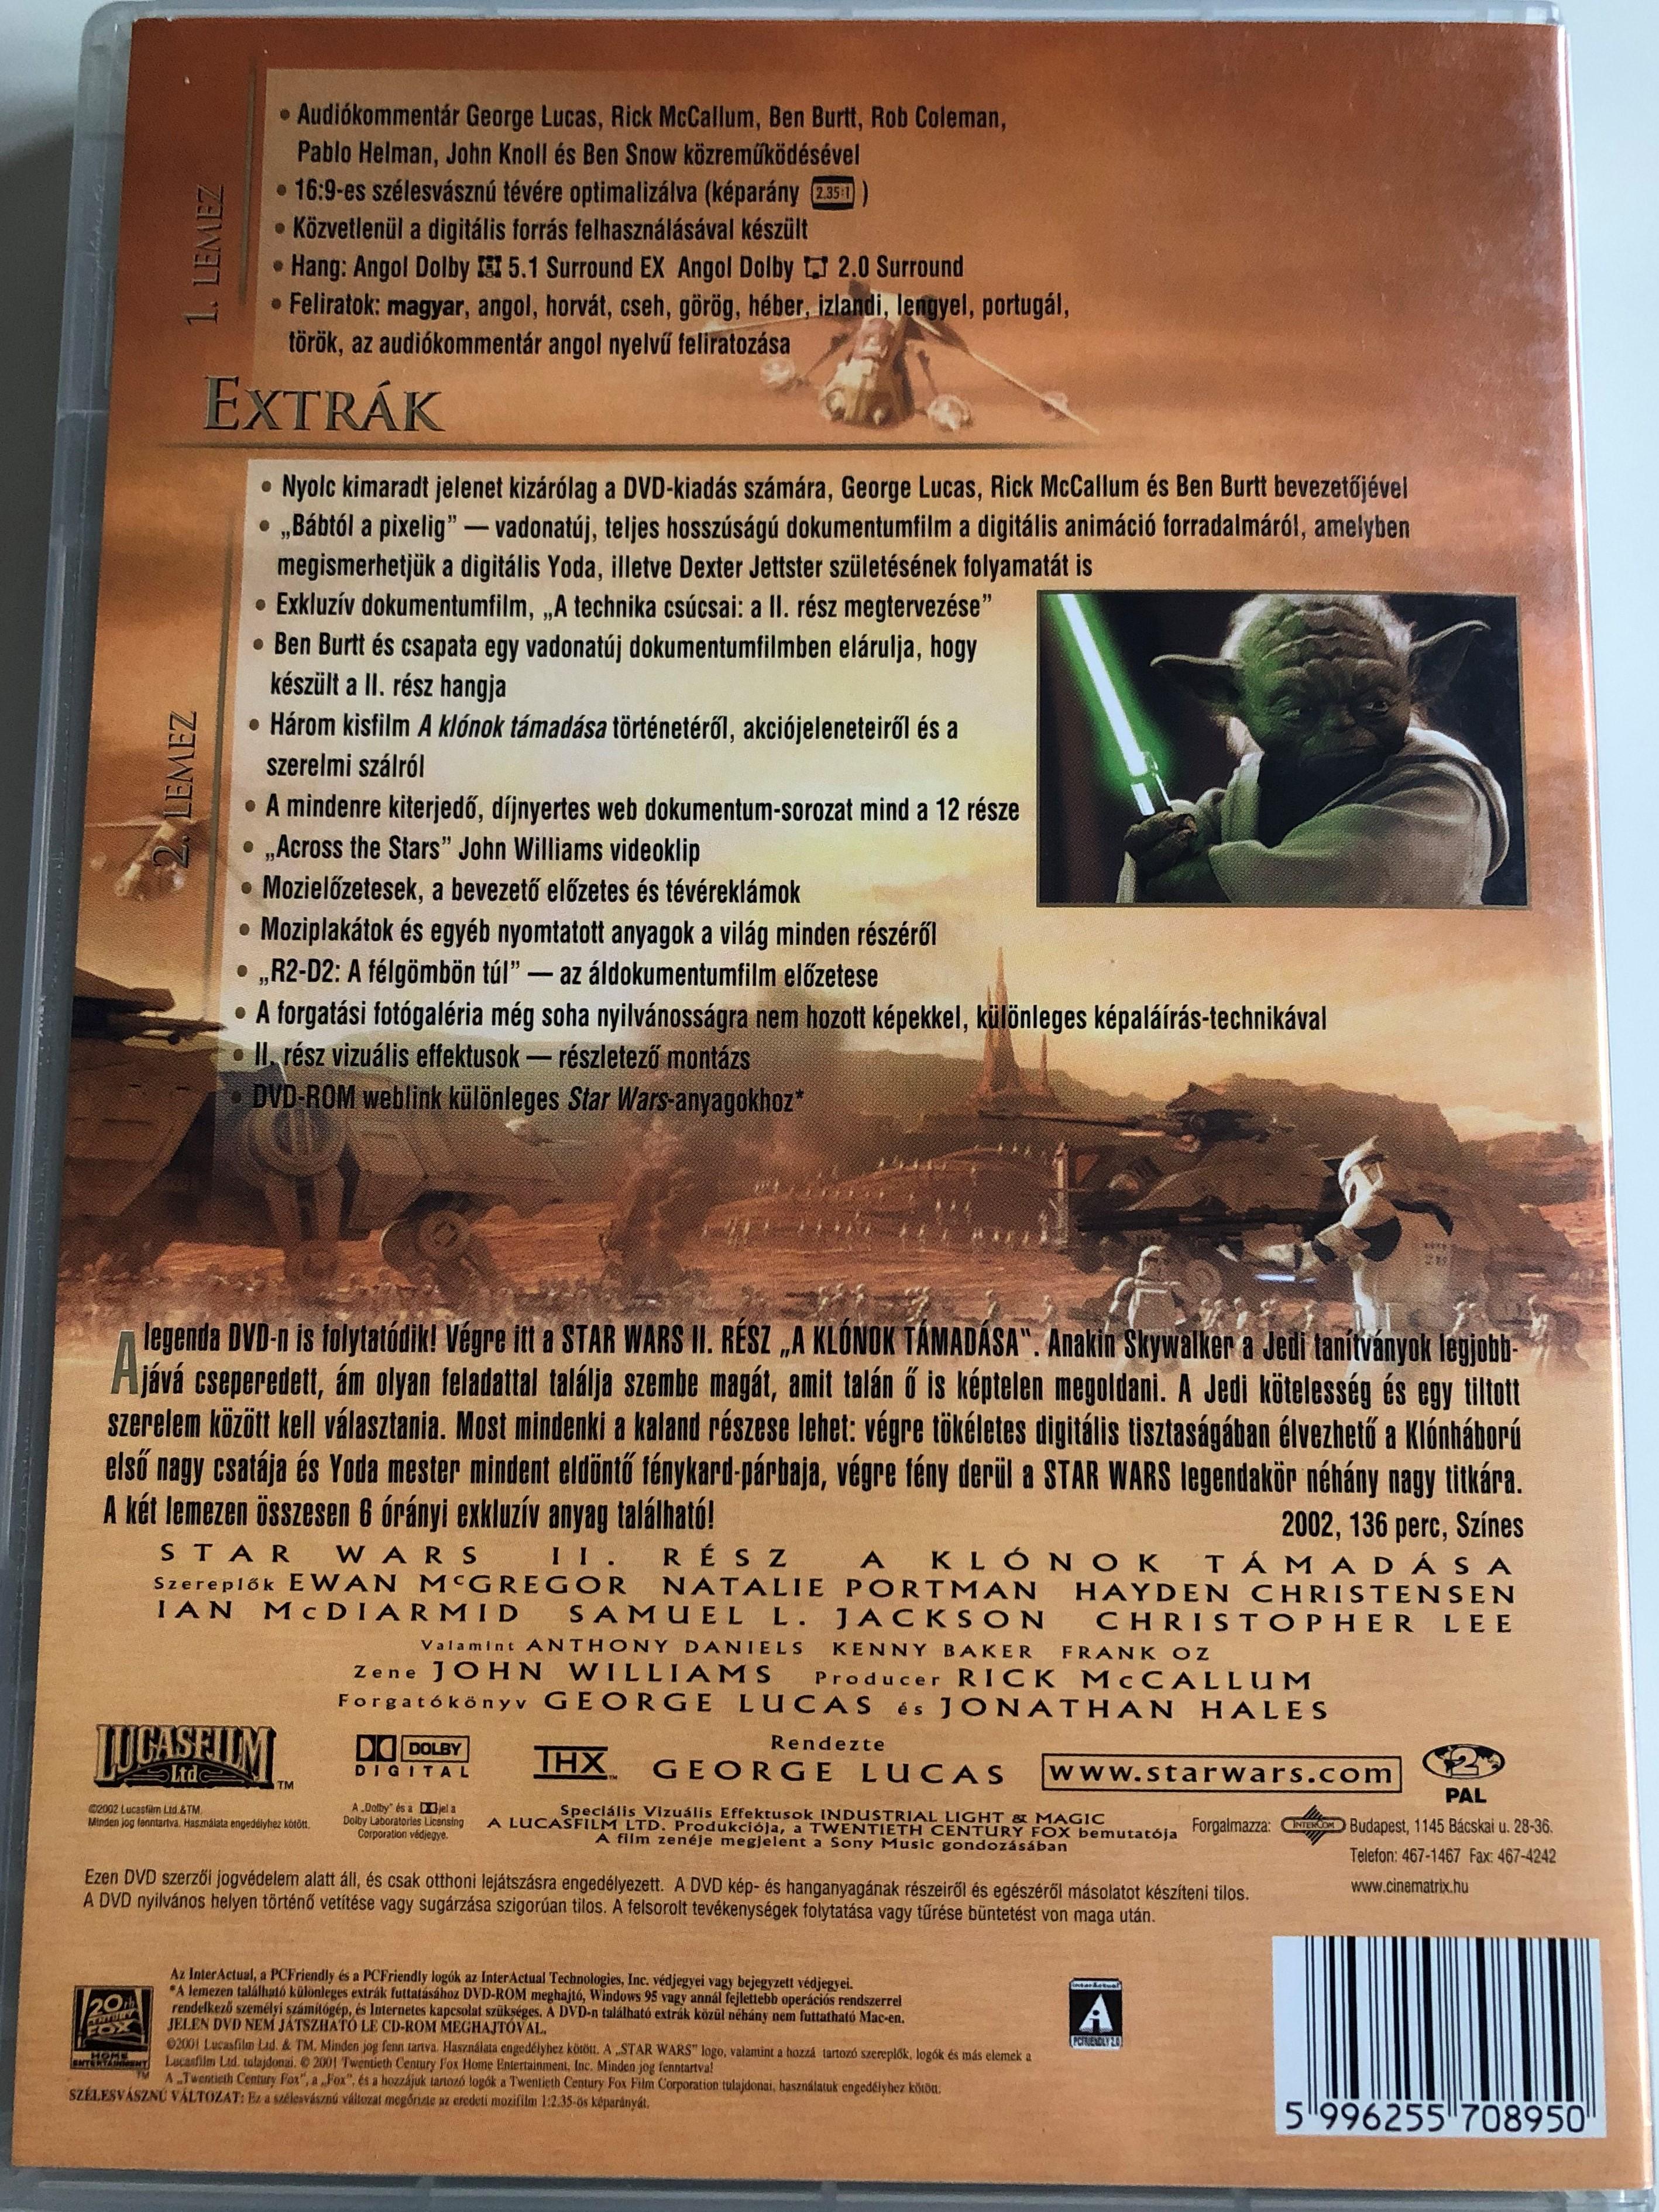 star-wars-ii-attack-of-the-clones-dvd-2002-a-kl-nok-t-mad-sa-4.jpg